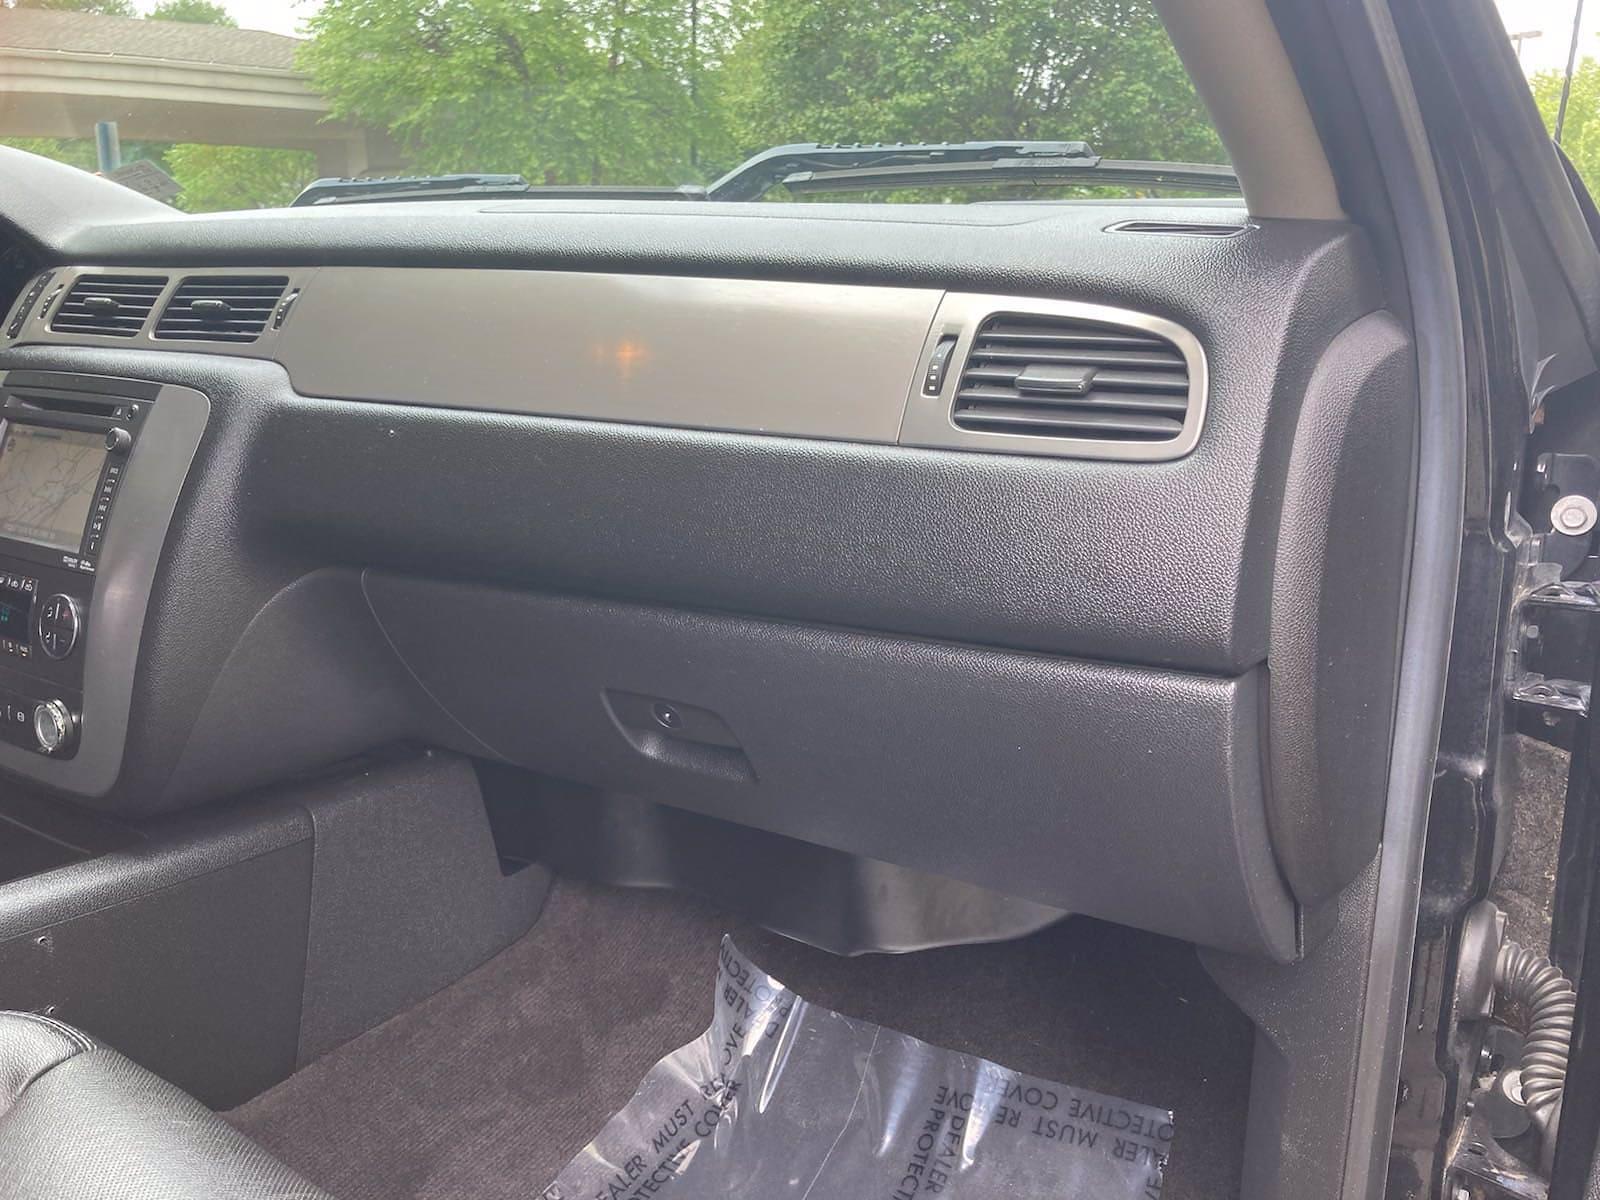 2014 Chevrolet Silverado 3500 Crew Cab 4x4, Pickup #FLU103111 - photo 19